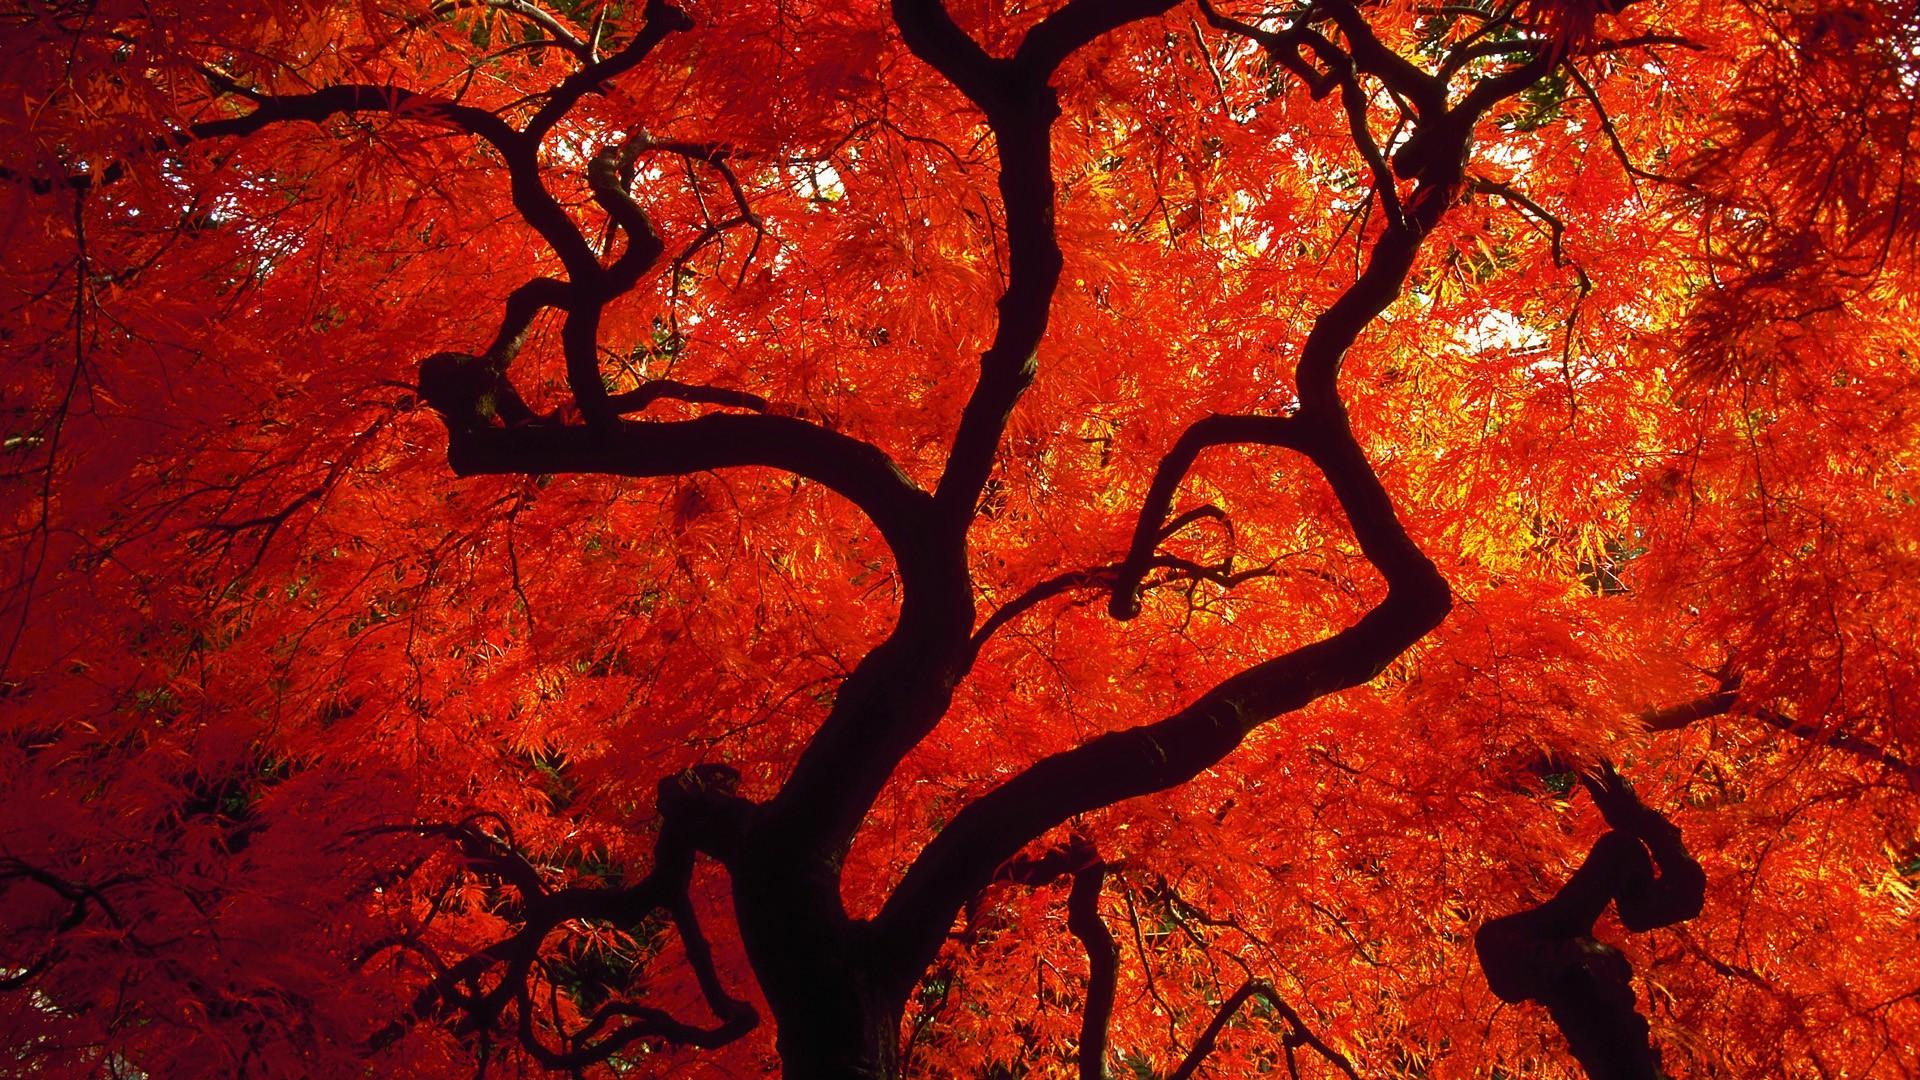 Trees Autumn Season Red Seattle Washington Wallpaper